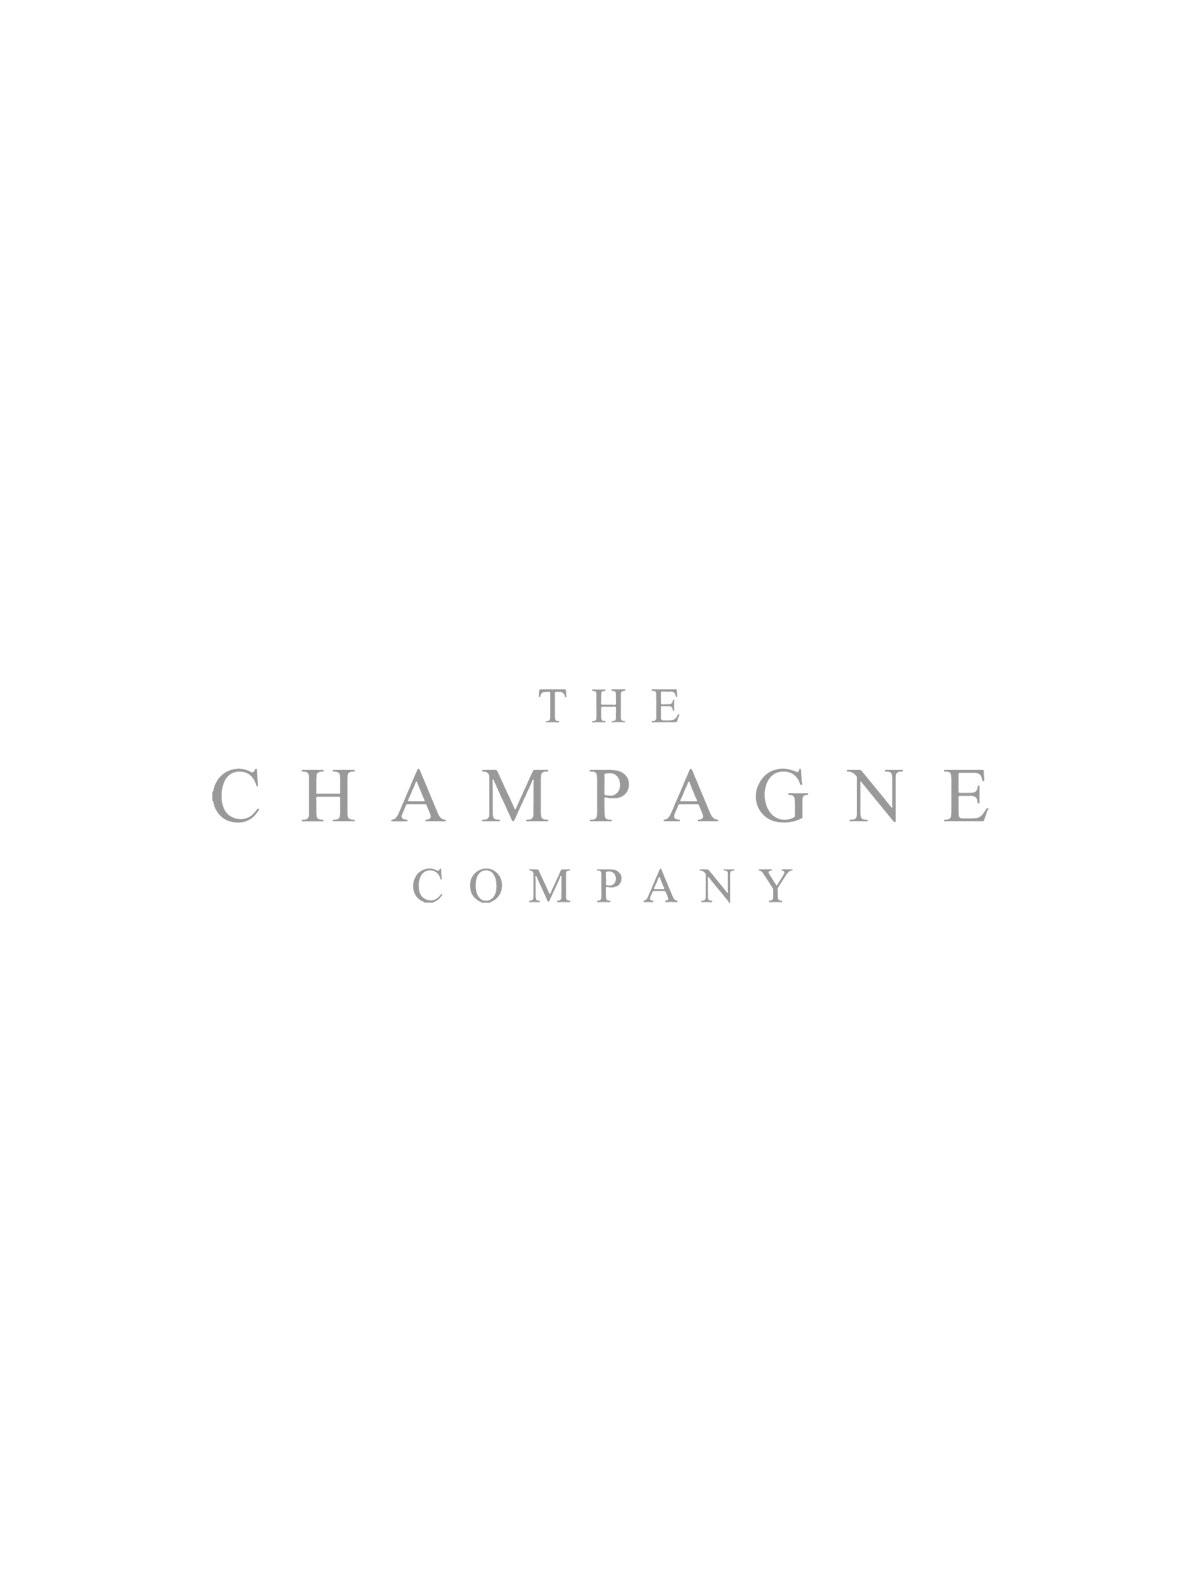 Dom Perignon 2009 Vintage Champagne Magnum 150cl Gift Box